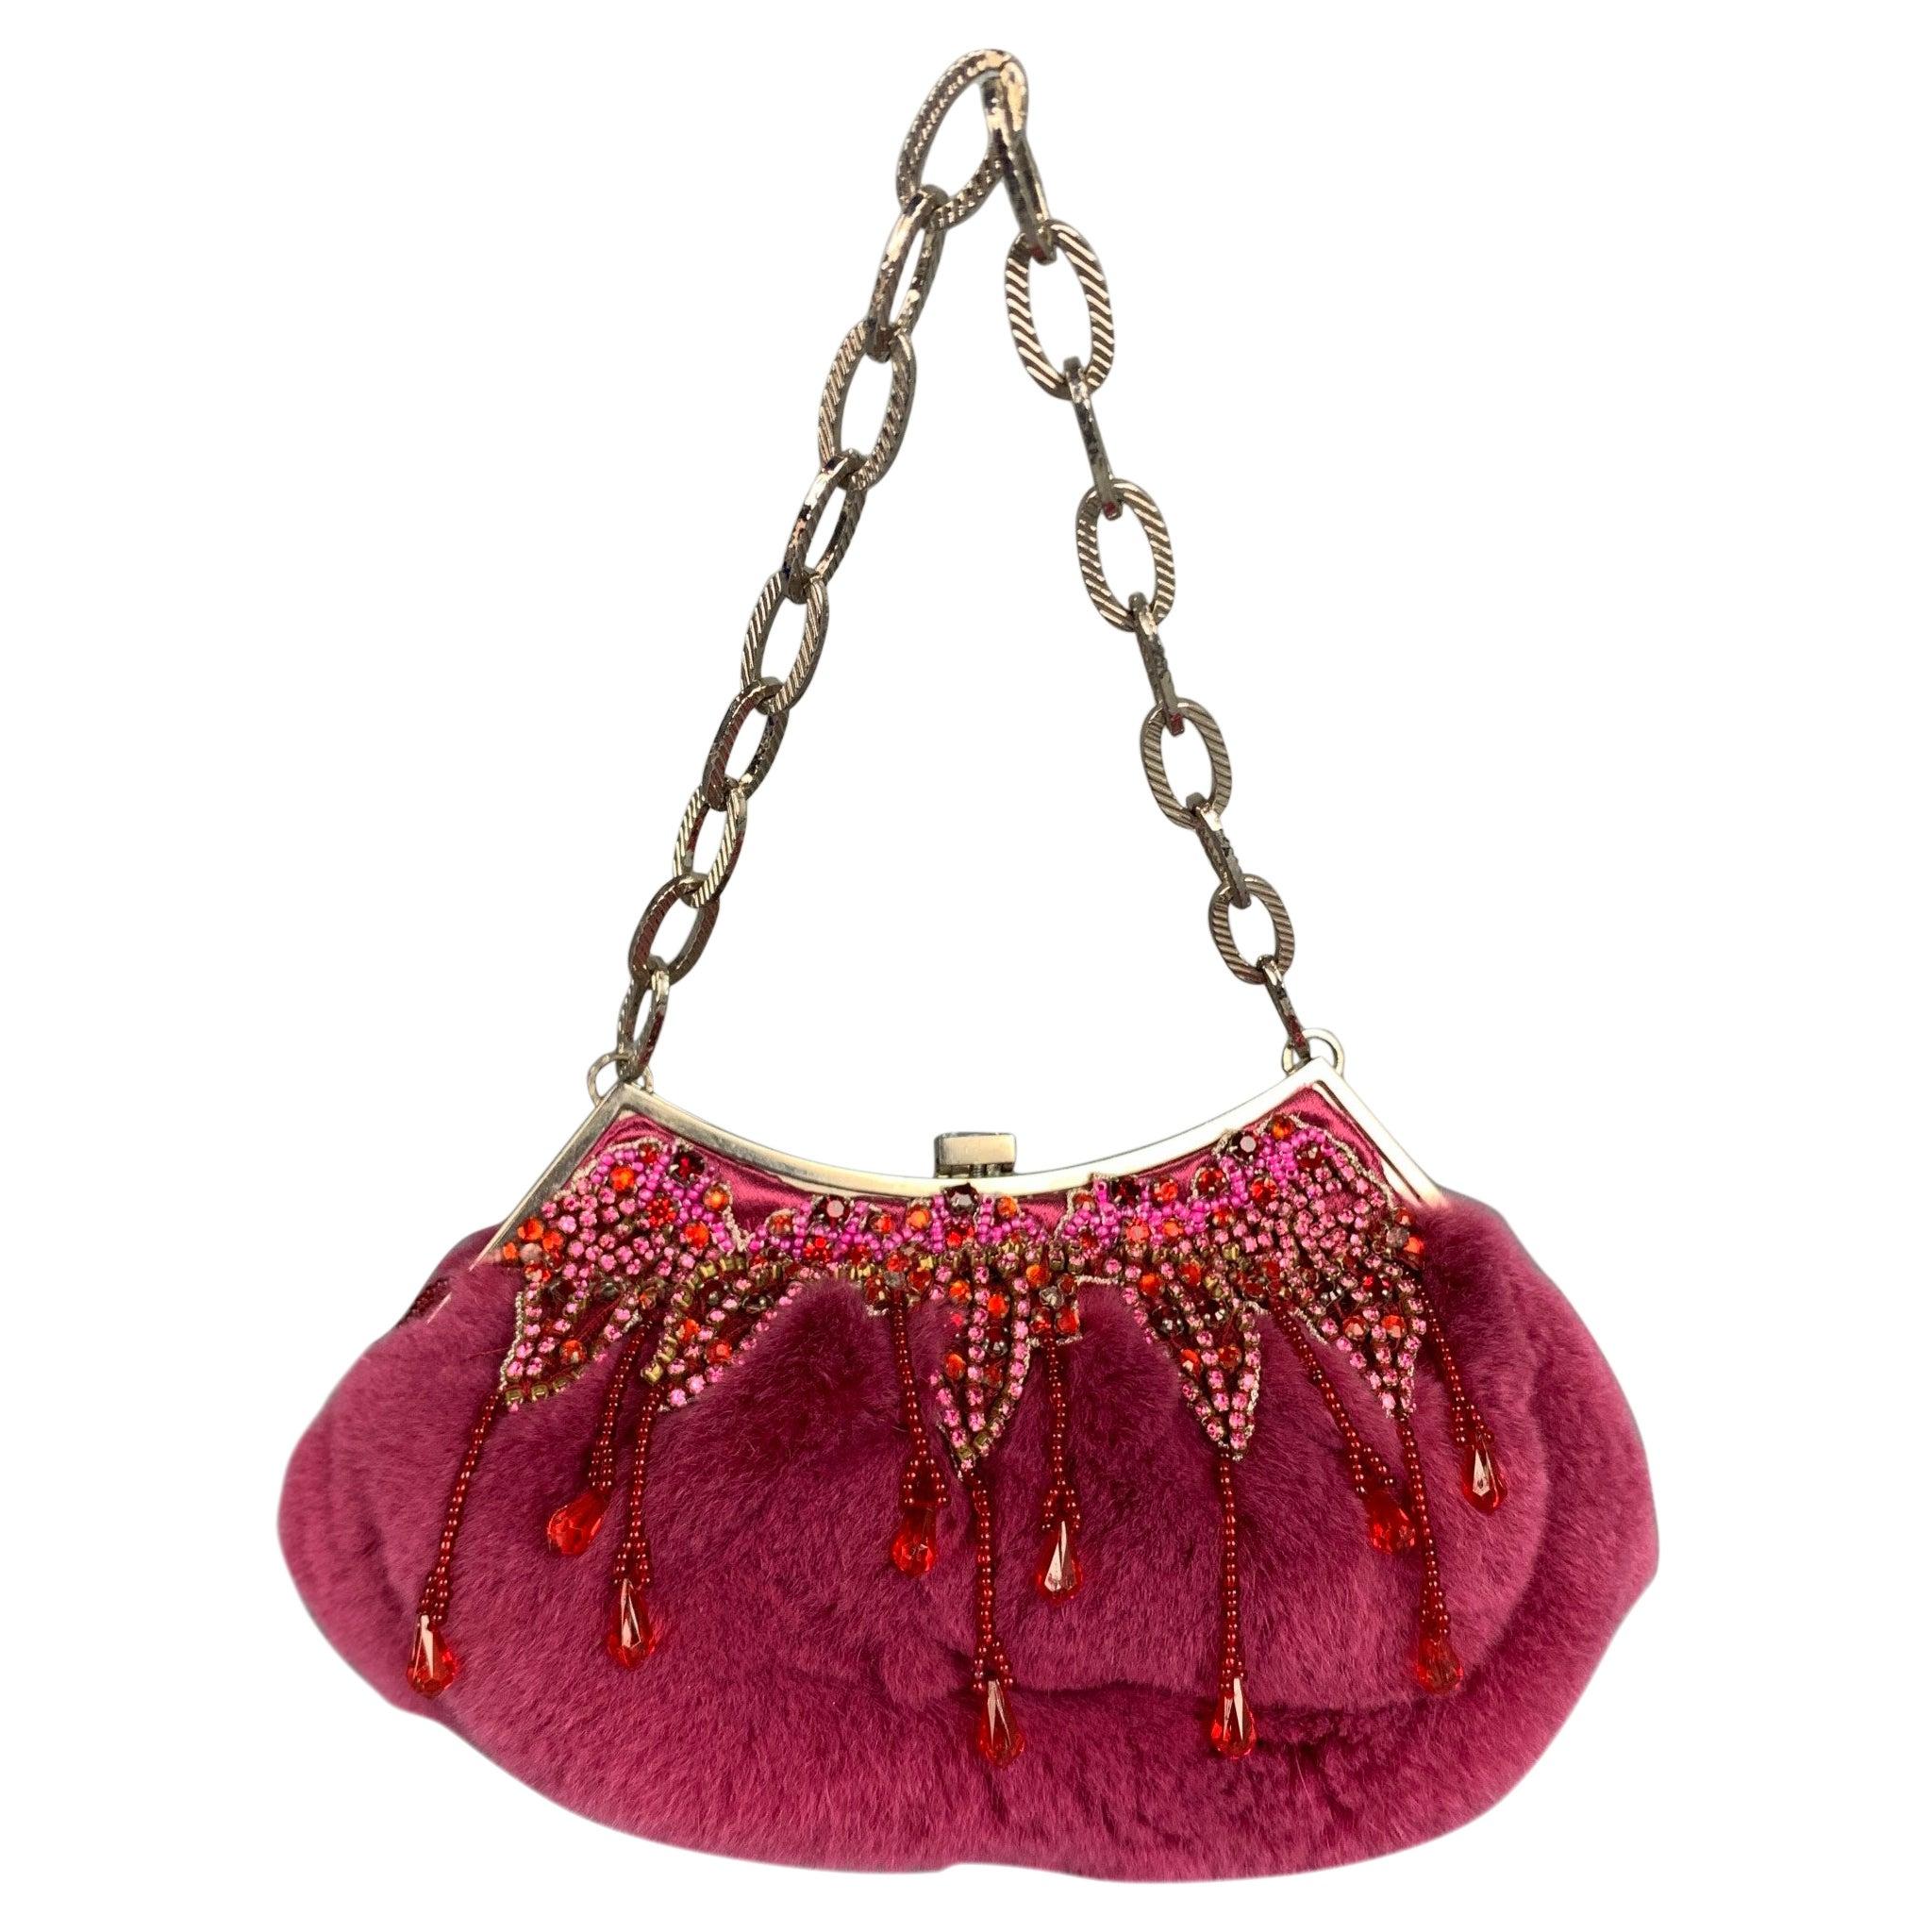 BADGLEY MISCHKA Purple & Silver Beaded Rhinestones Fur Handbag